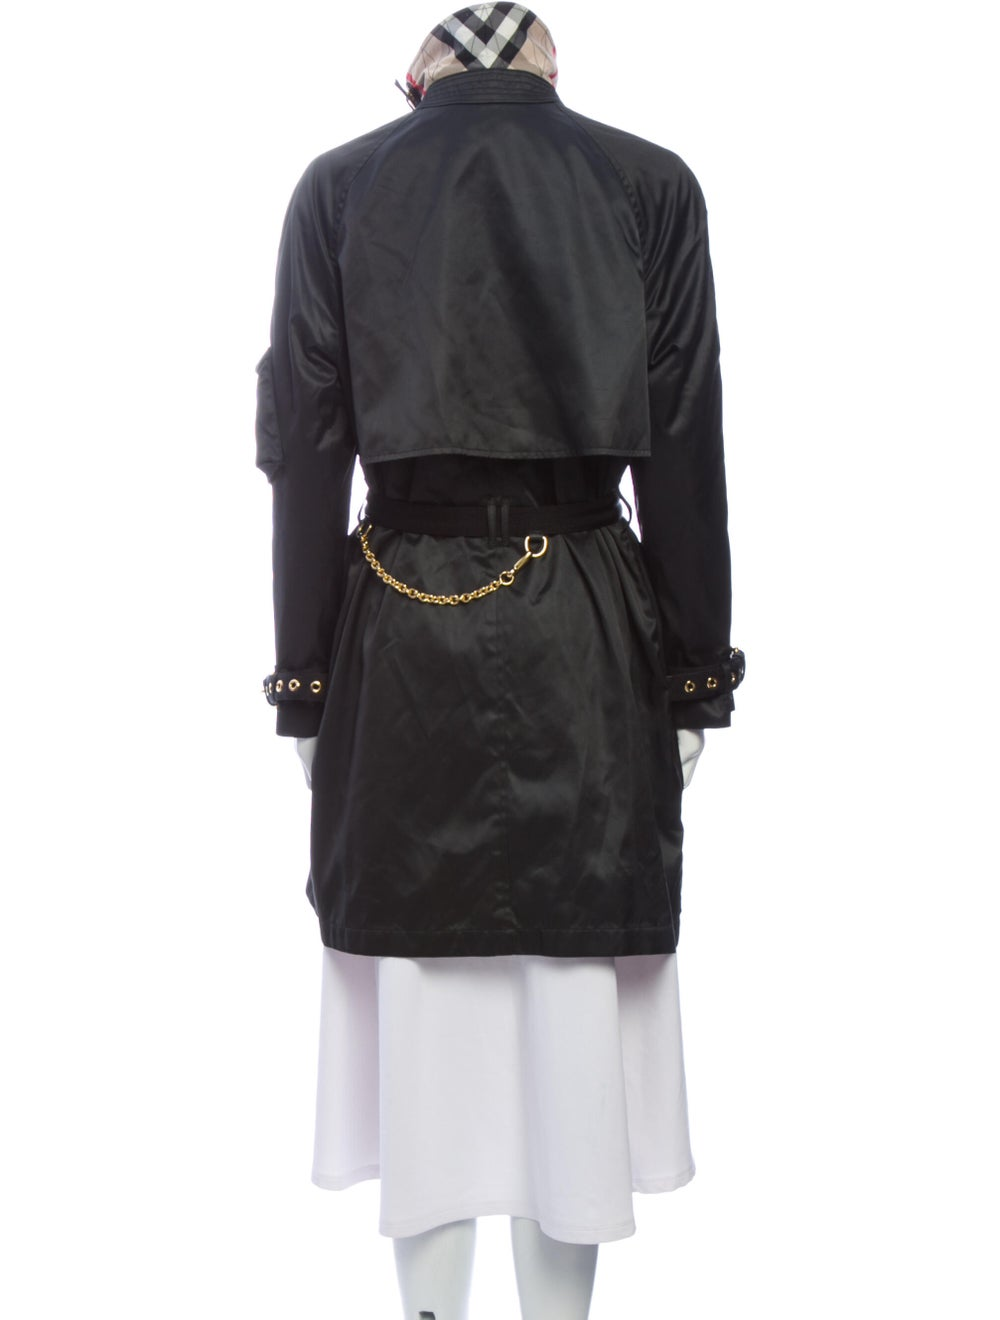 Burberry Trench Coat Black - image 3